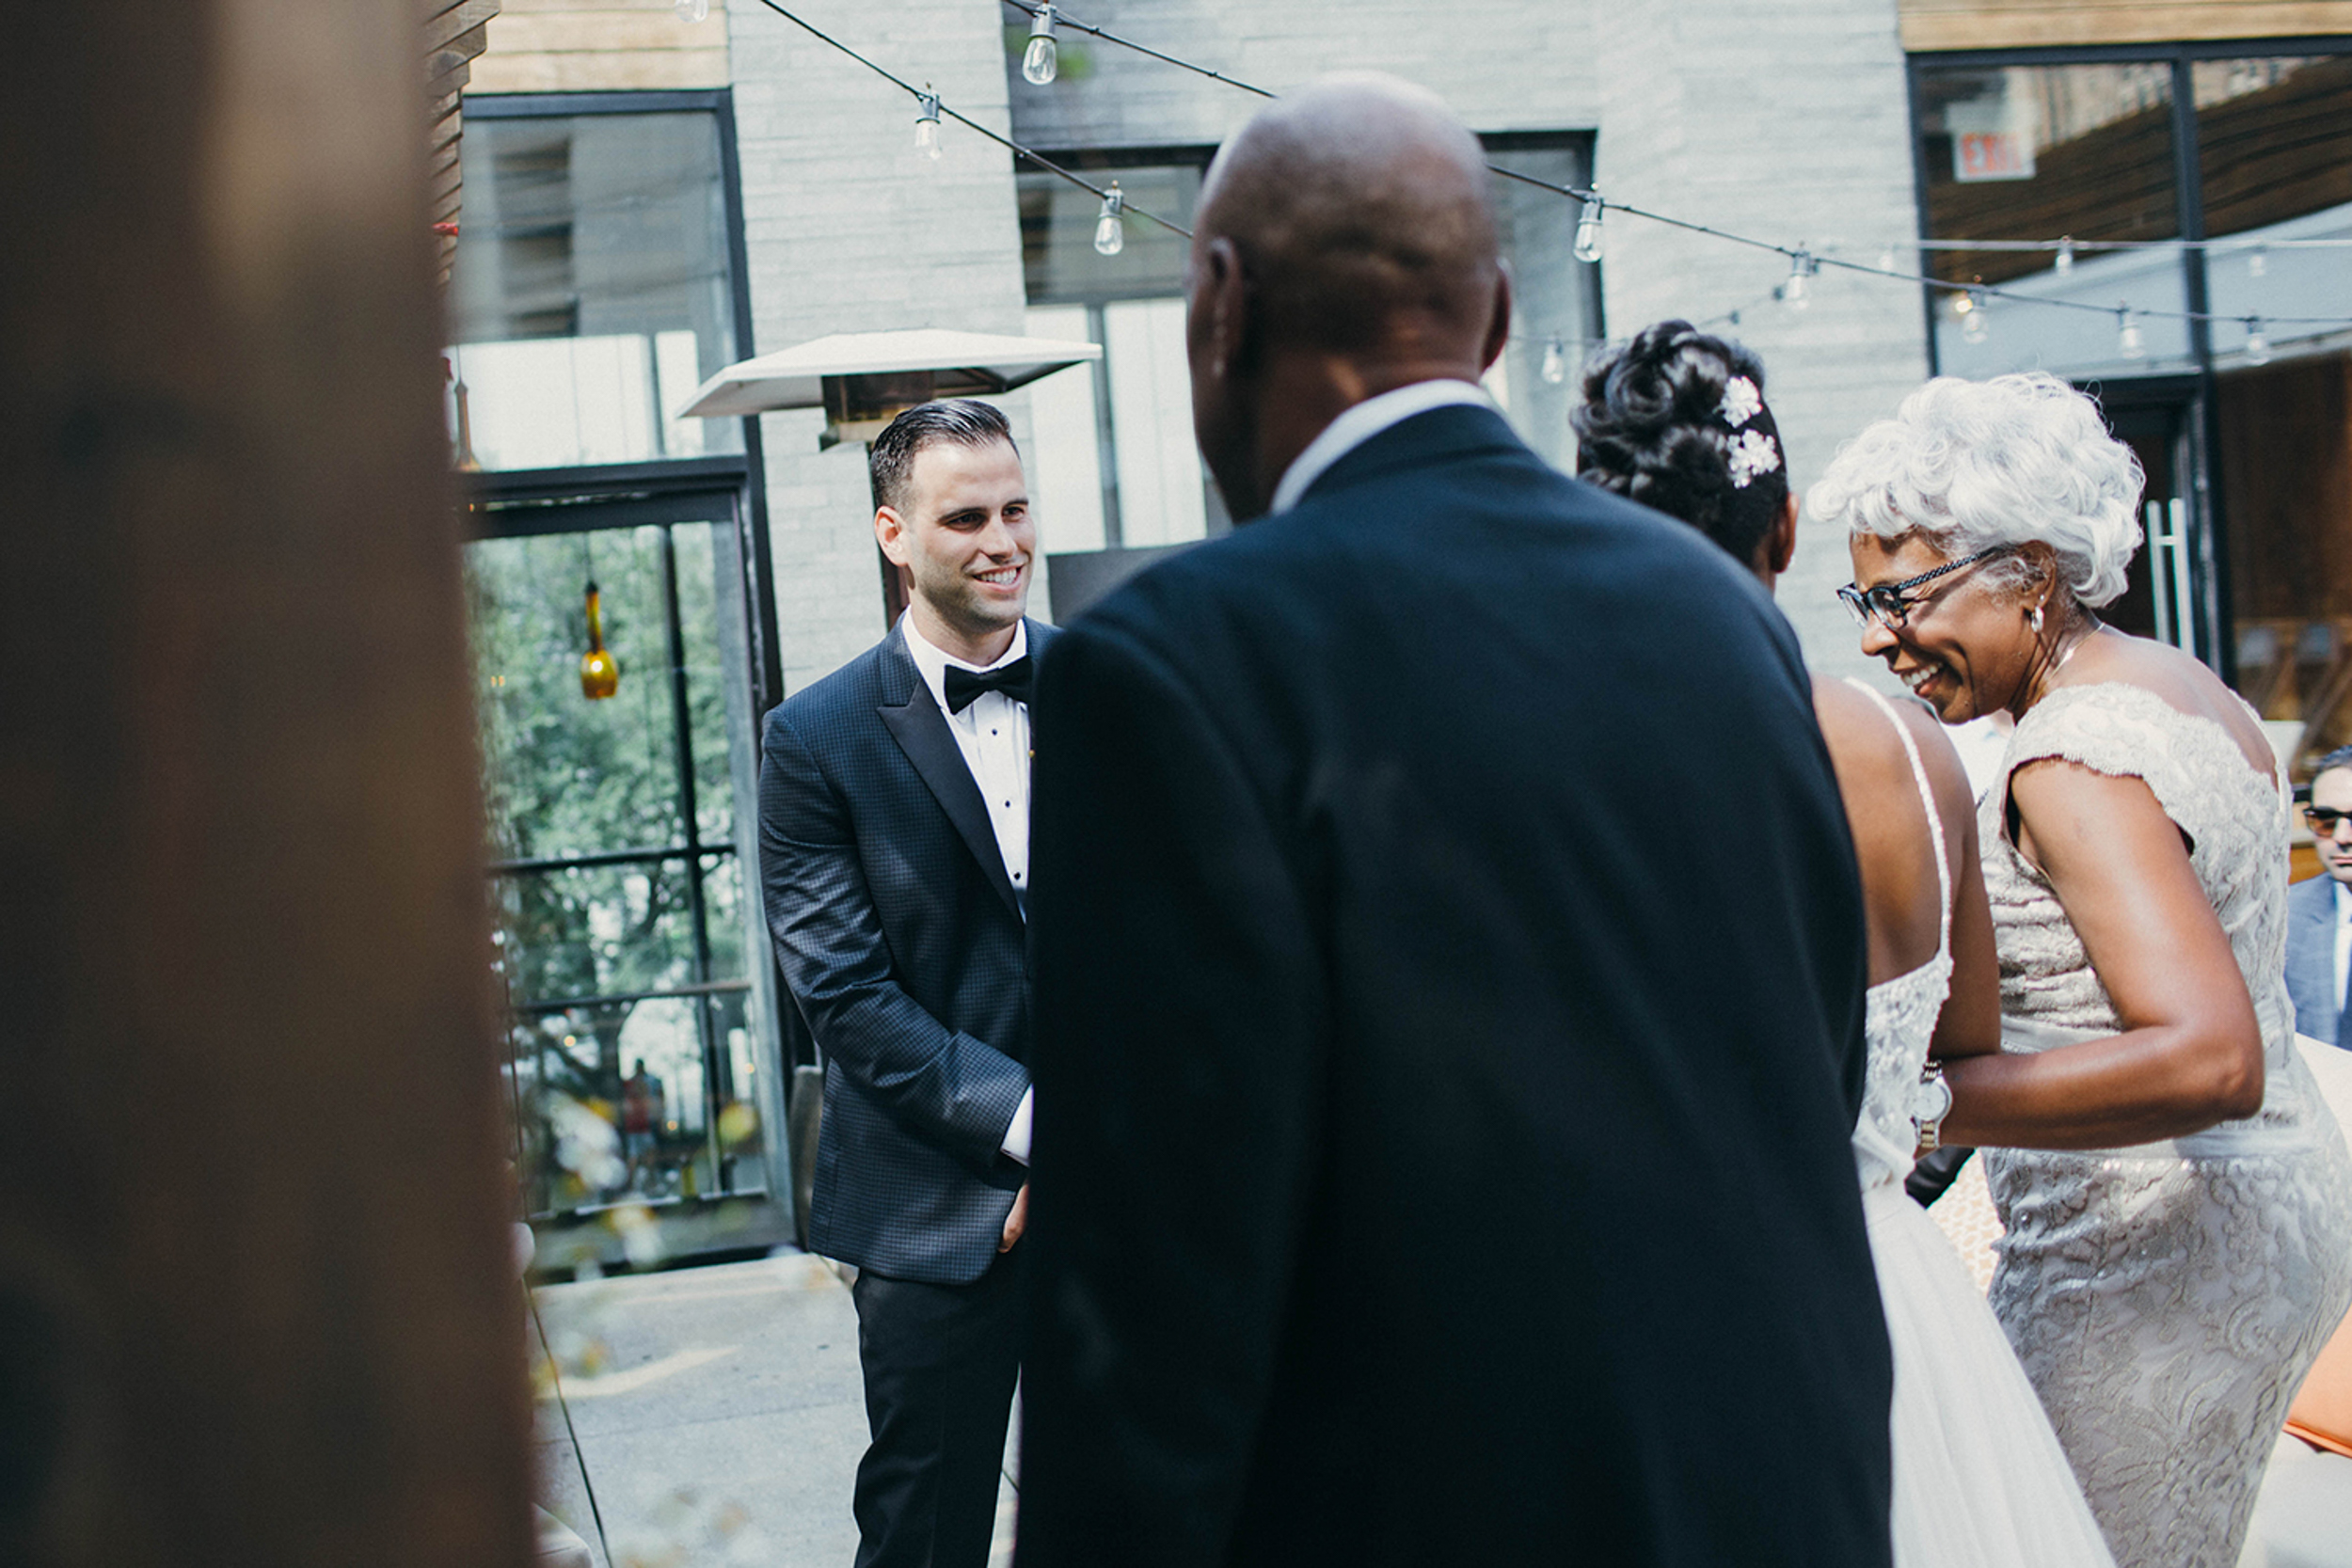 chicago.wedding.urban.intimate.zed451.lake.milton olive park-46.jpg